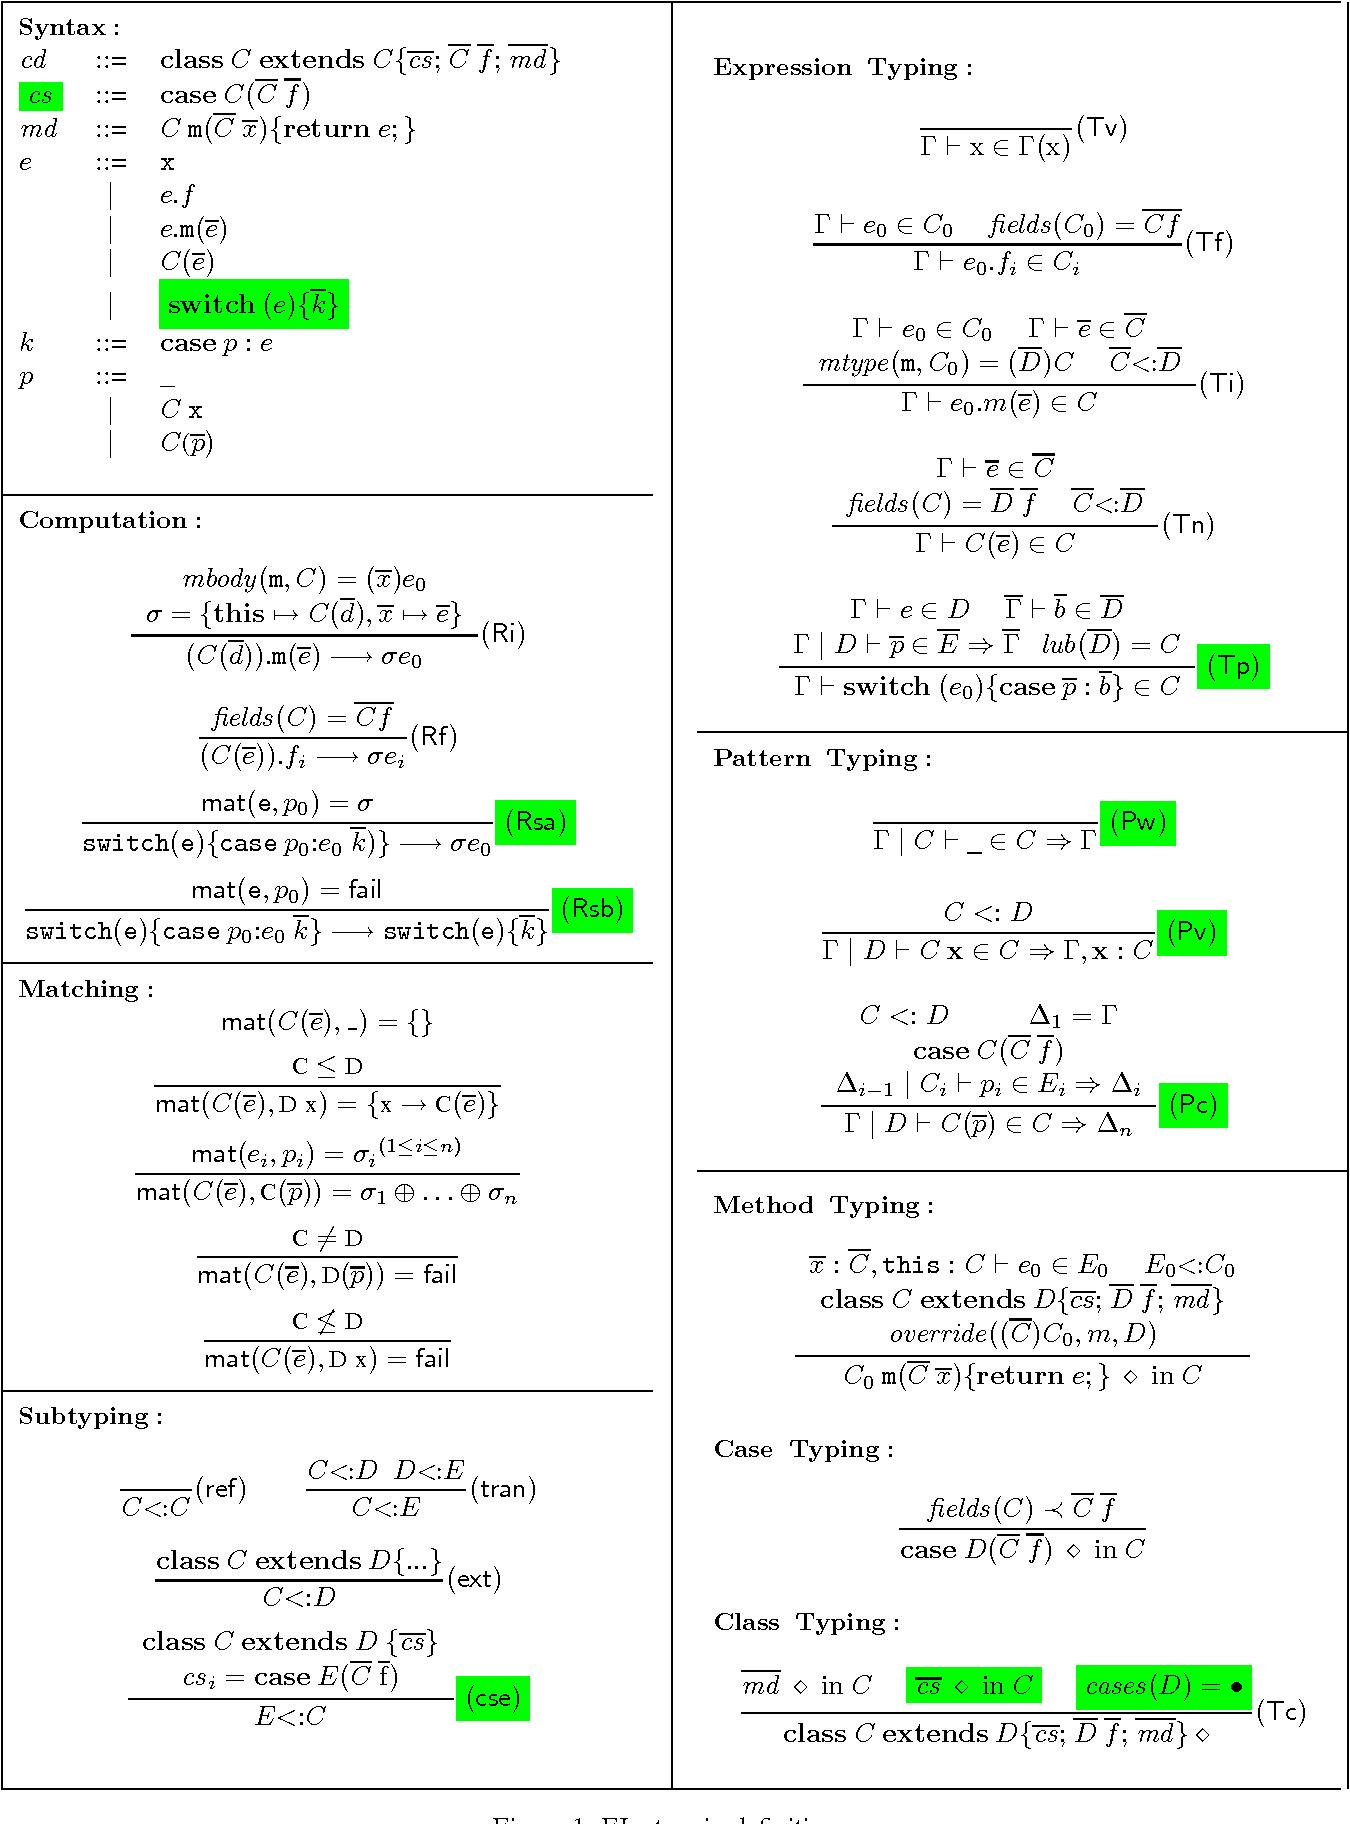 Figure 1: FJpat main definitions